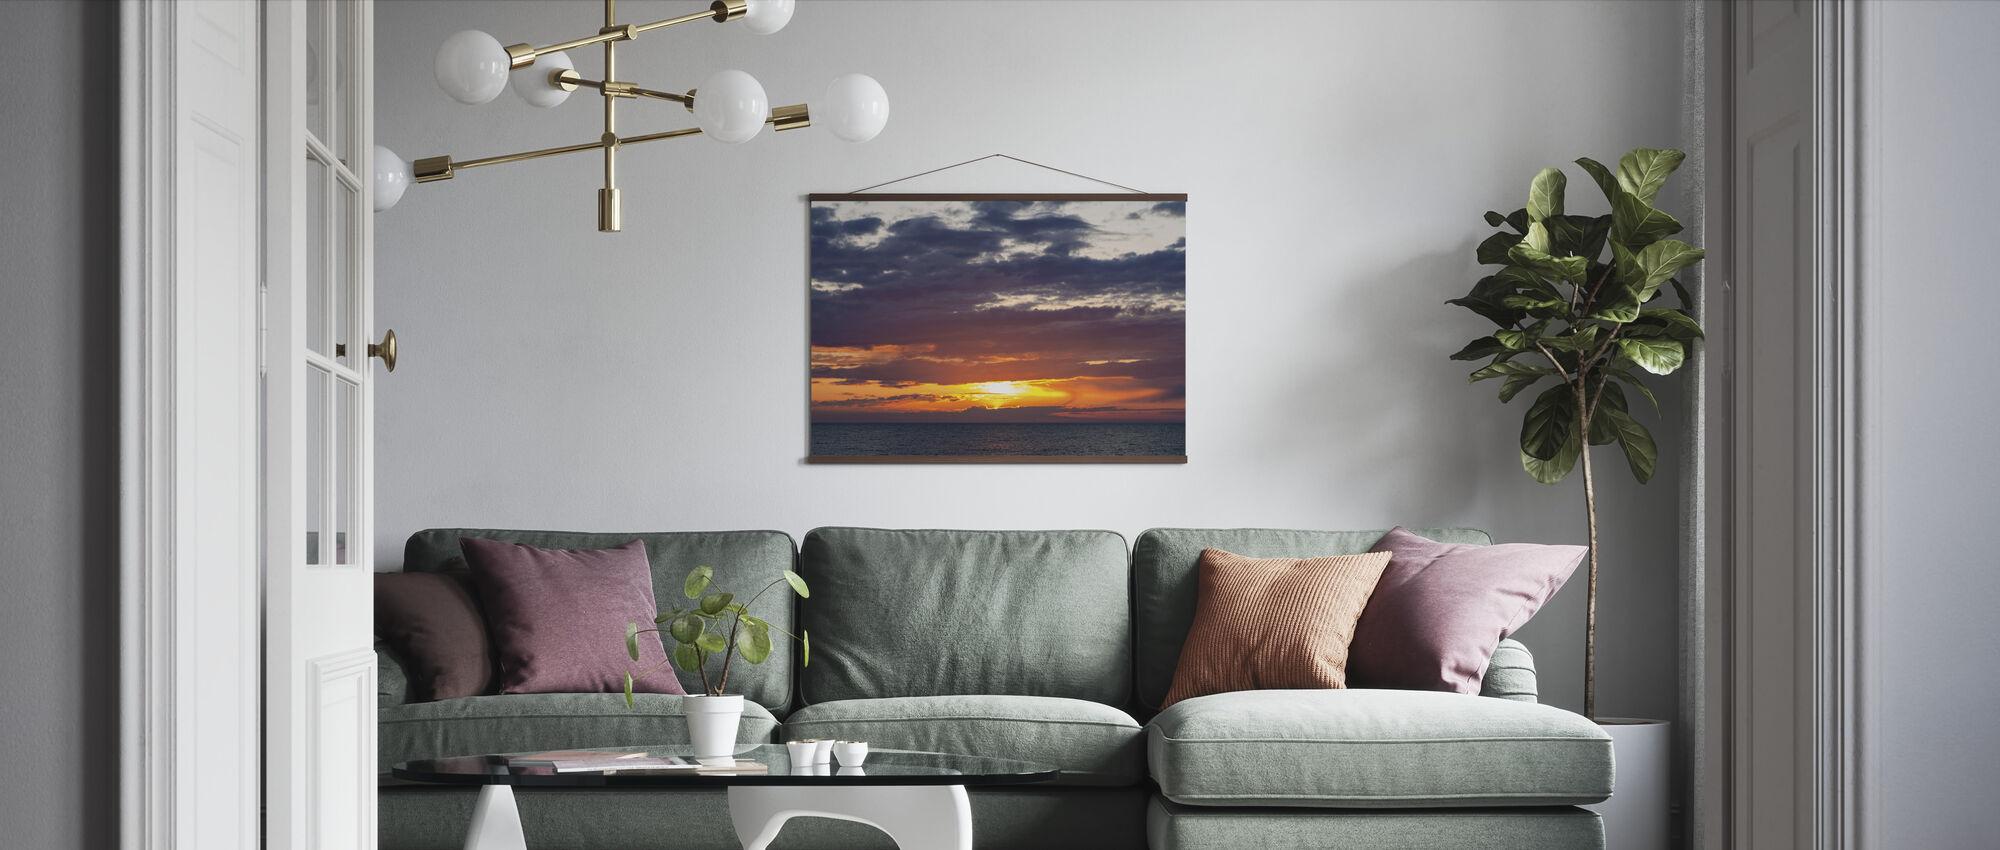 Evening Sky - Poster - Living Room